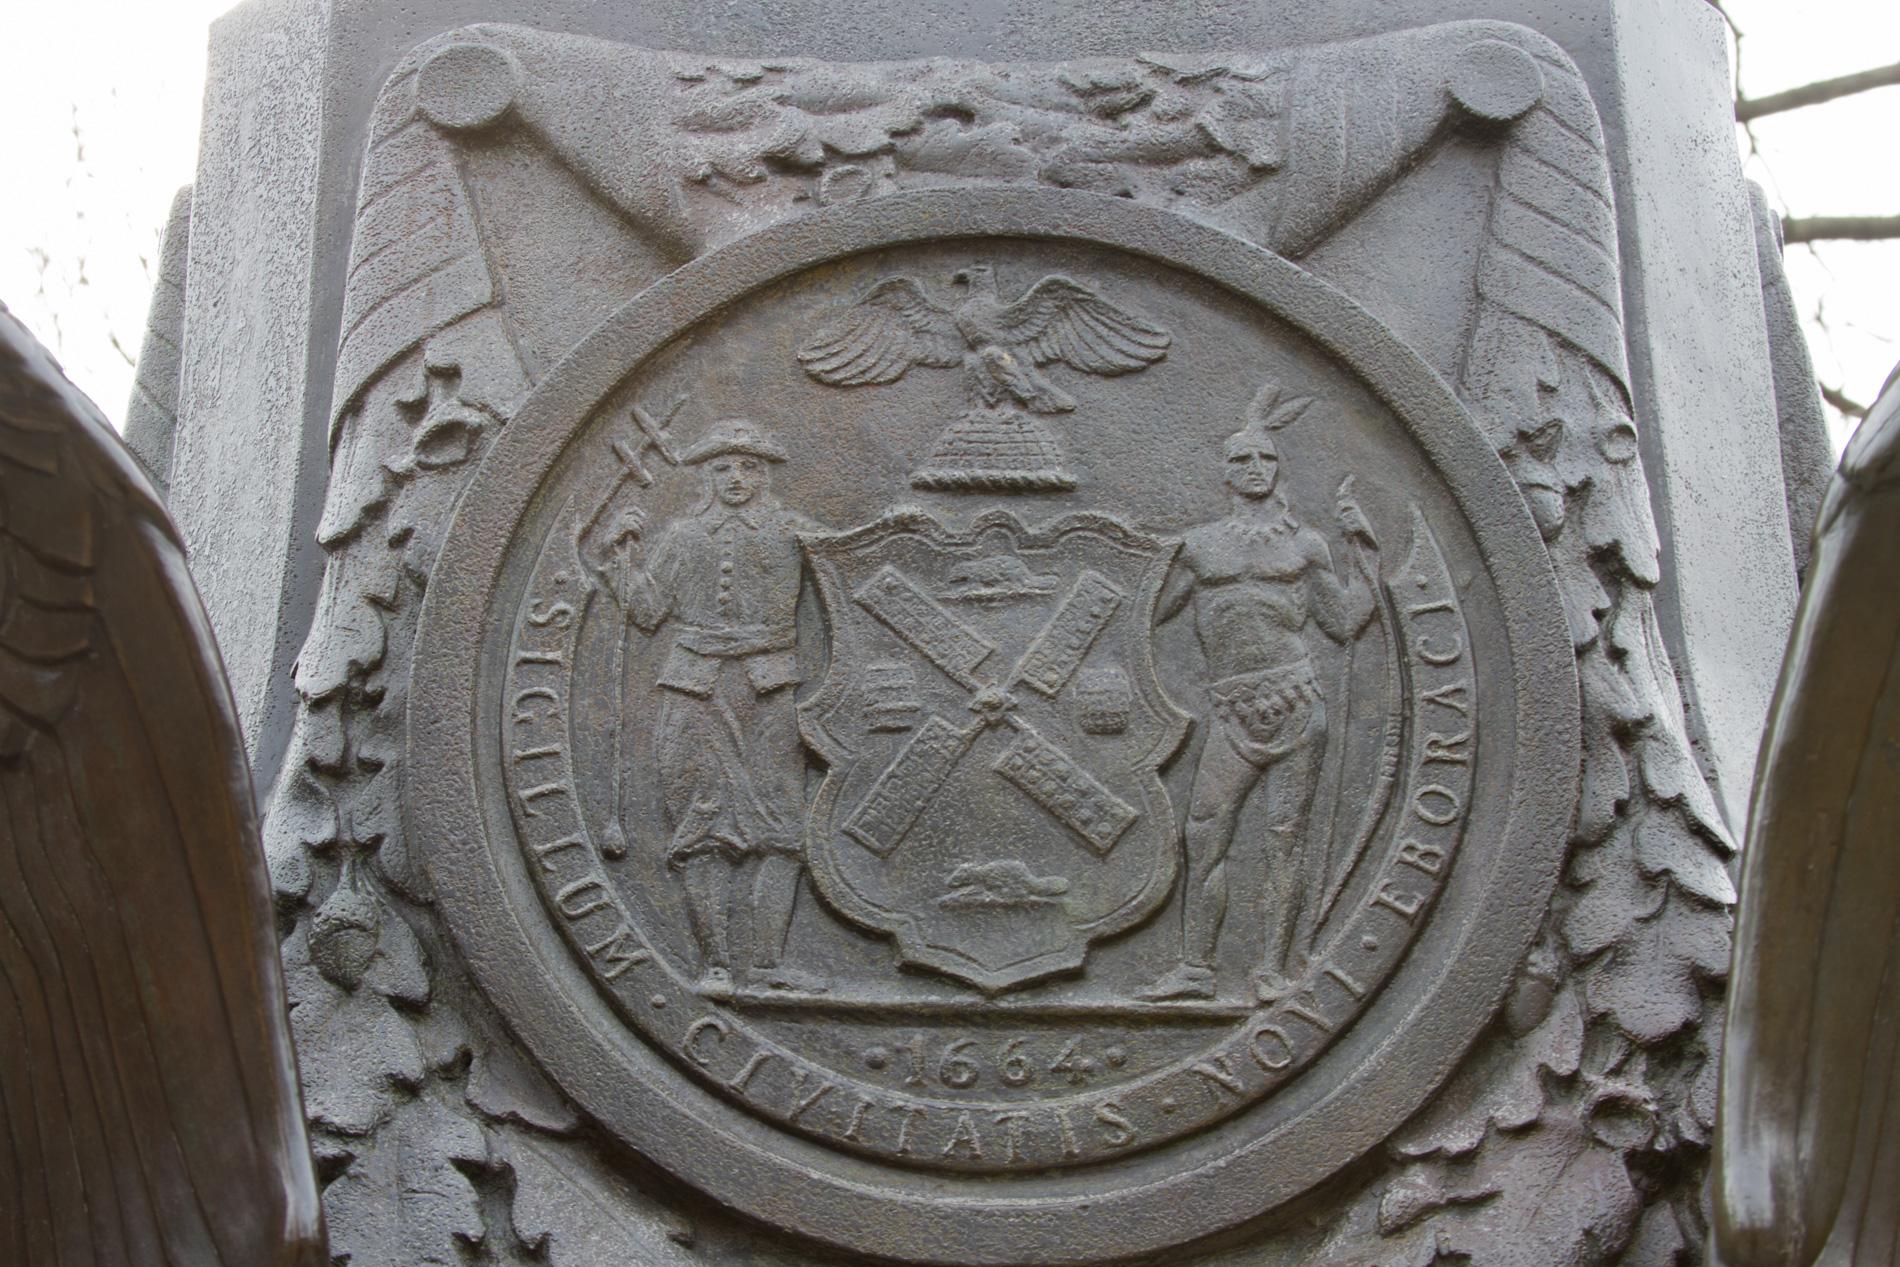 City Employees Memorial [1507]